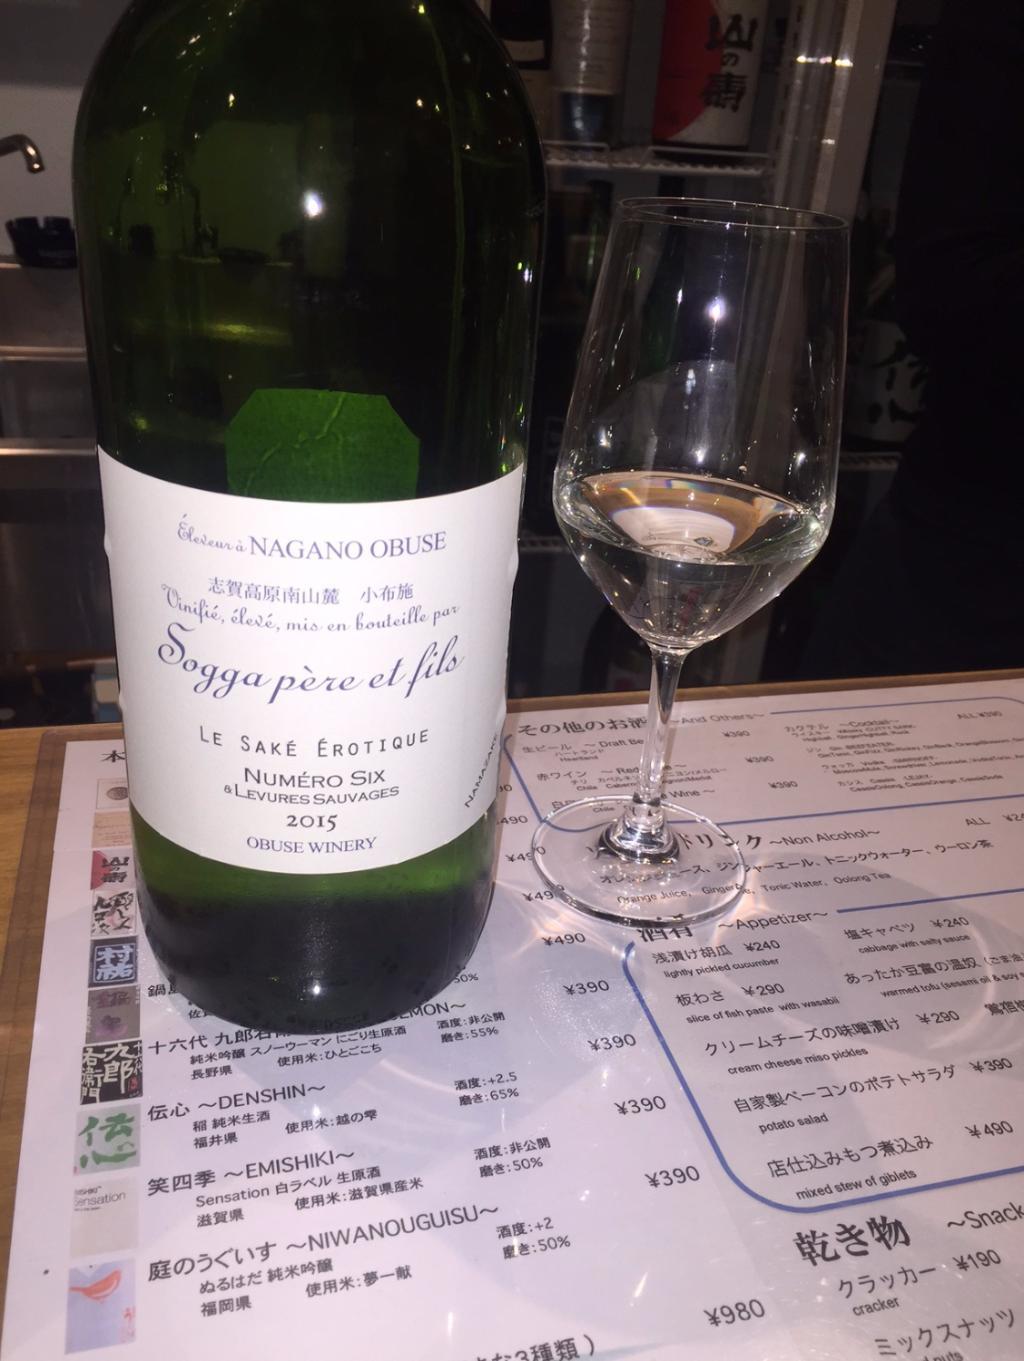 Served in wine glasses